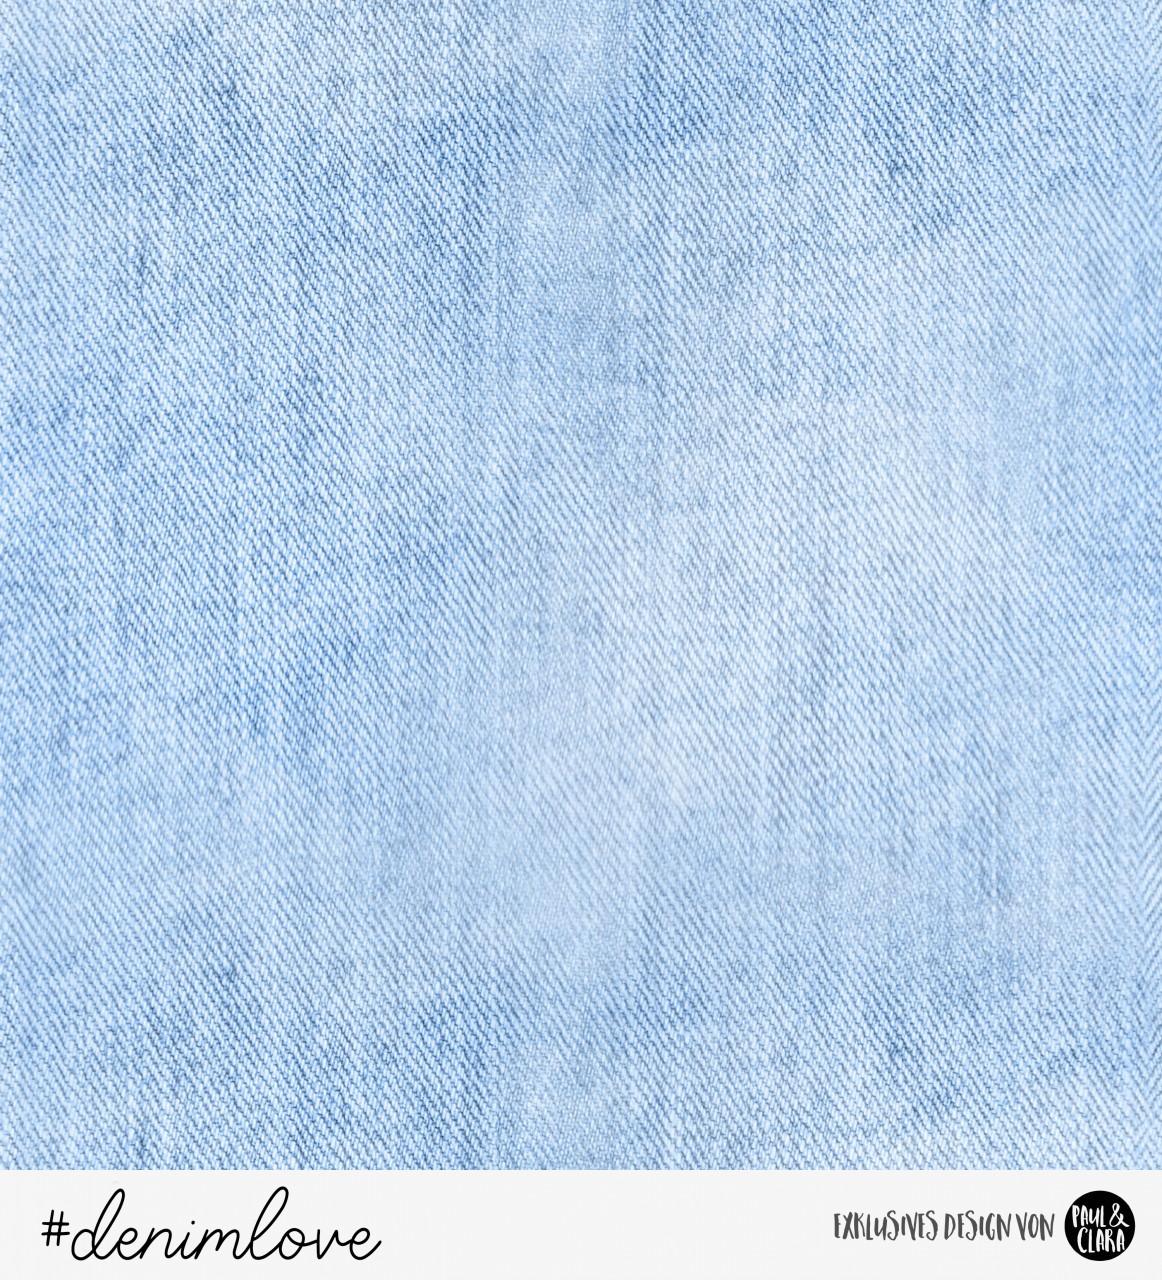 58 cm RESTSTÜCK-denimlove  - Hellblau *Bio-Sommersweat*